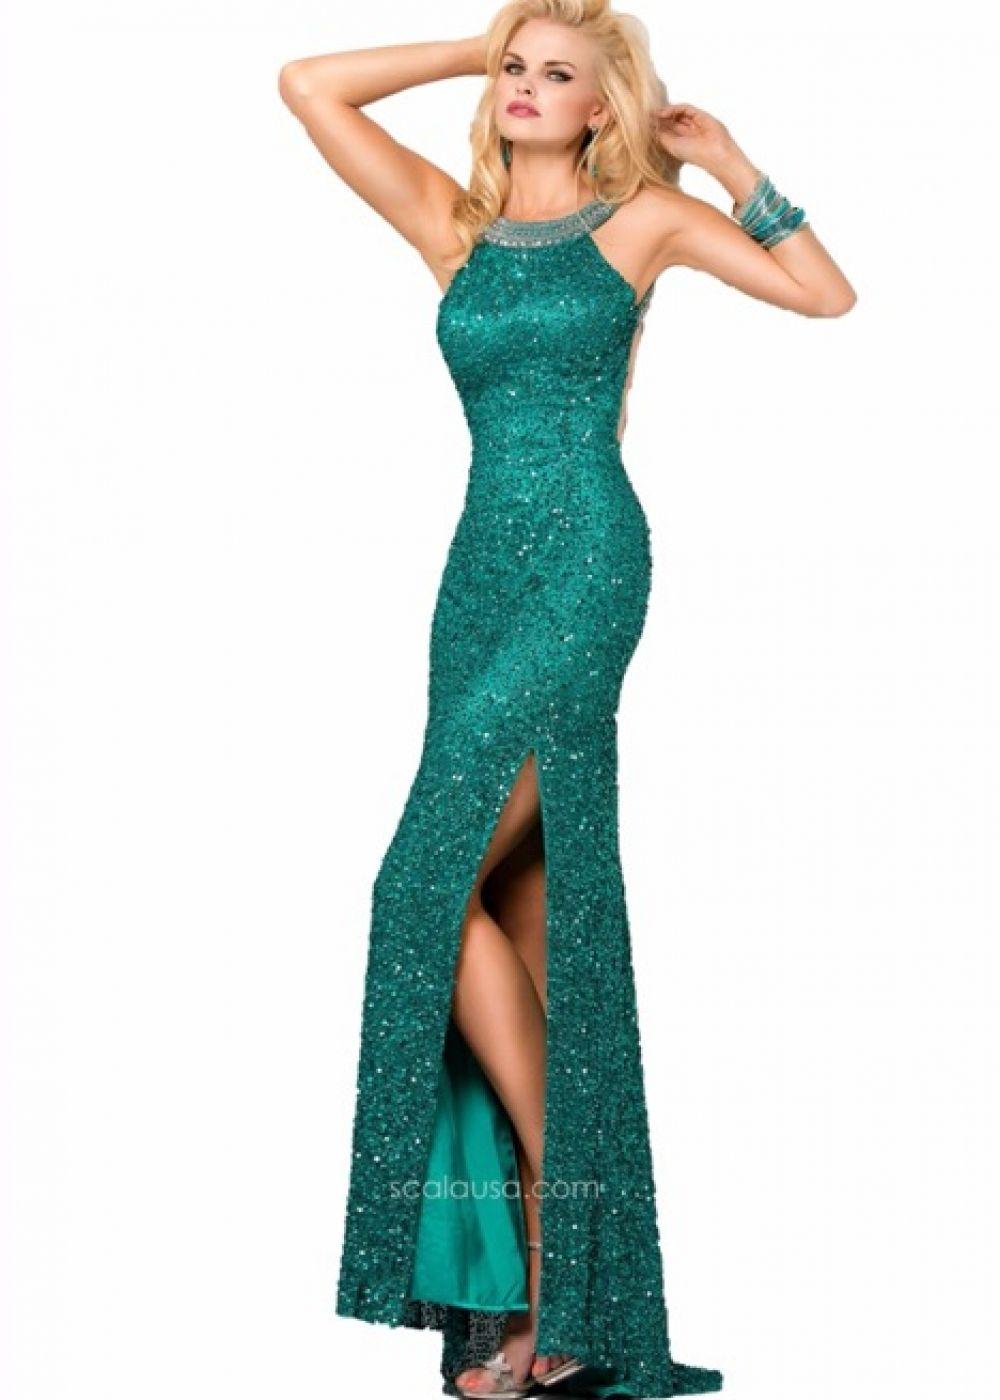 Scala 48406   Party Dresses   Pinterest   Dresses, Parties and Dress ...